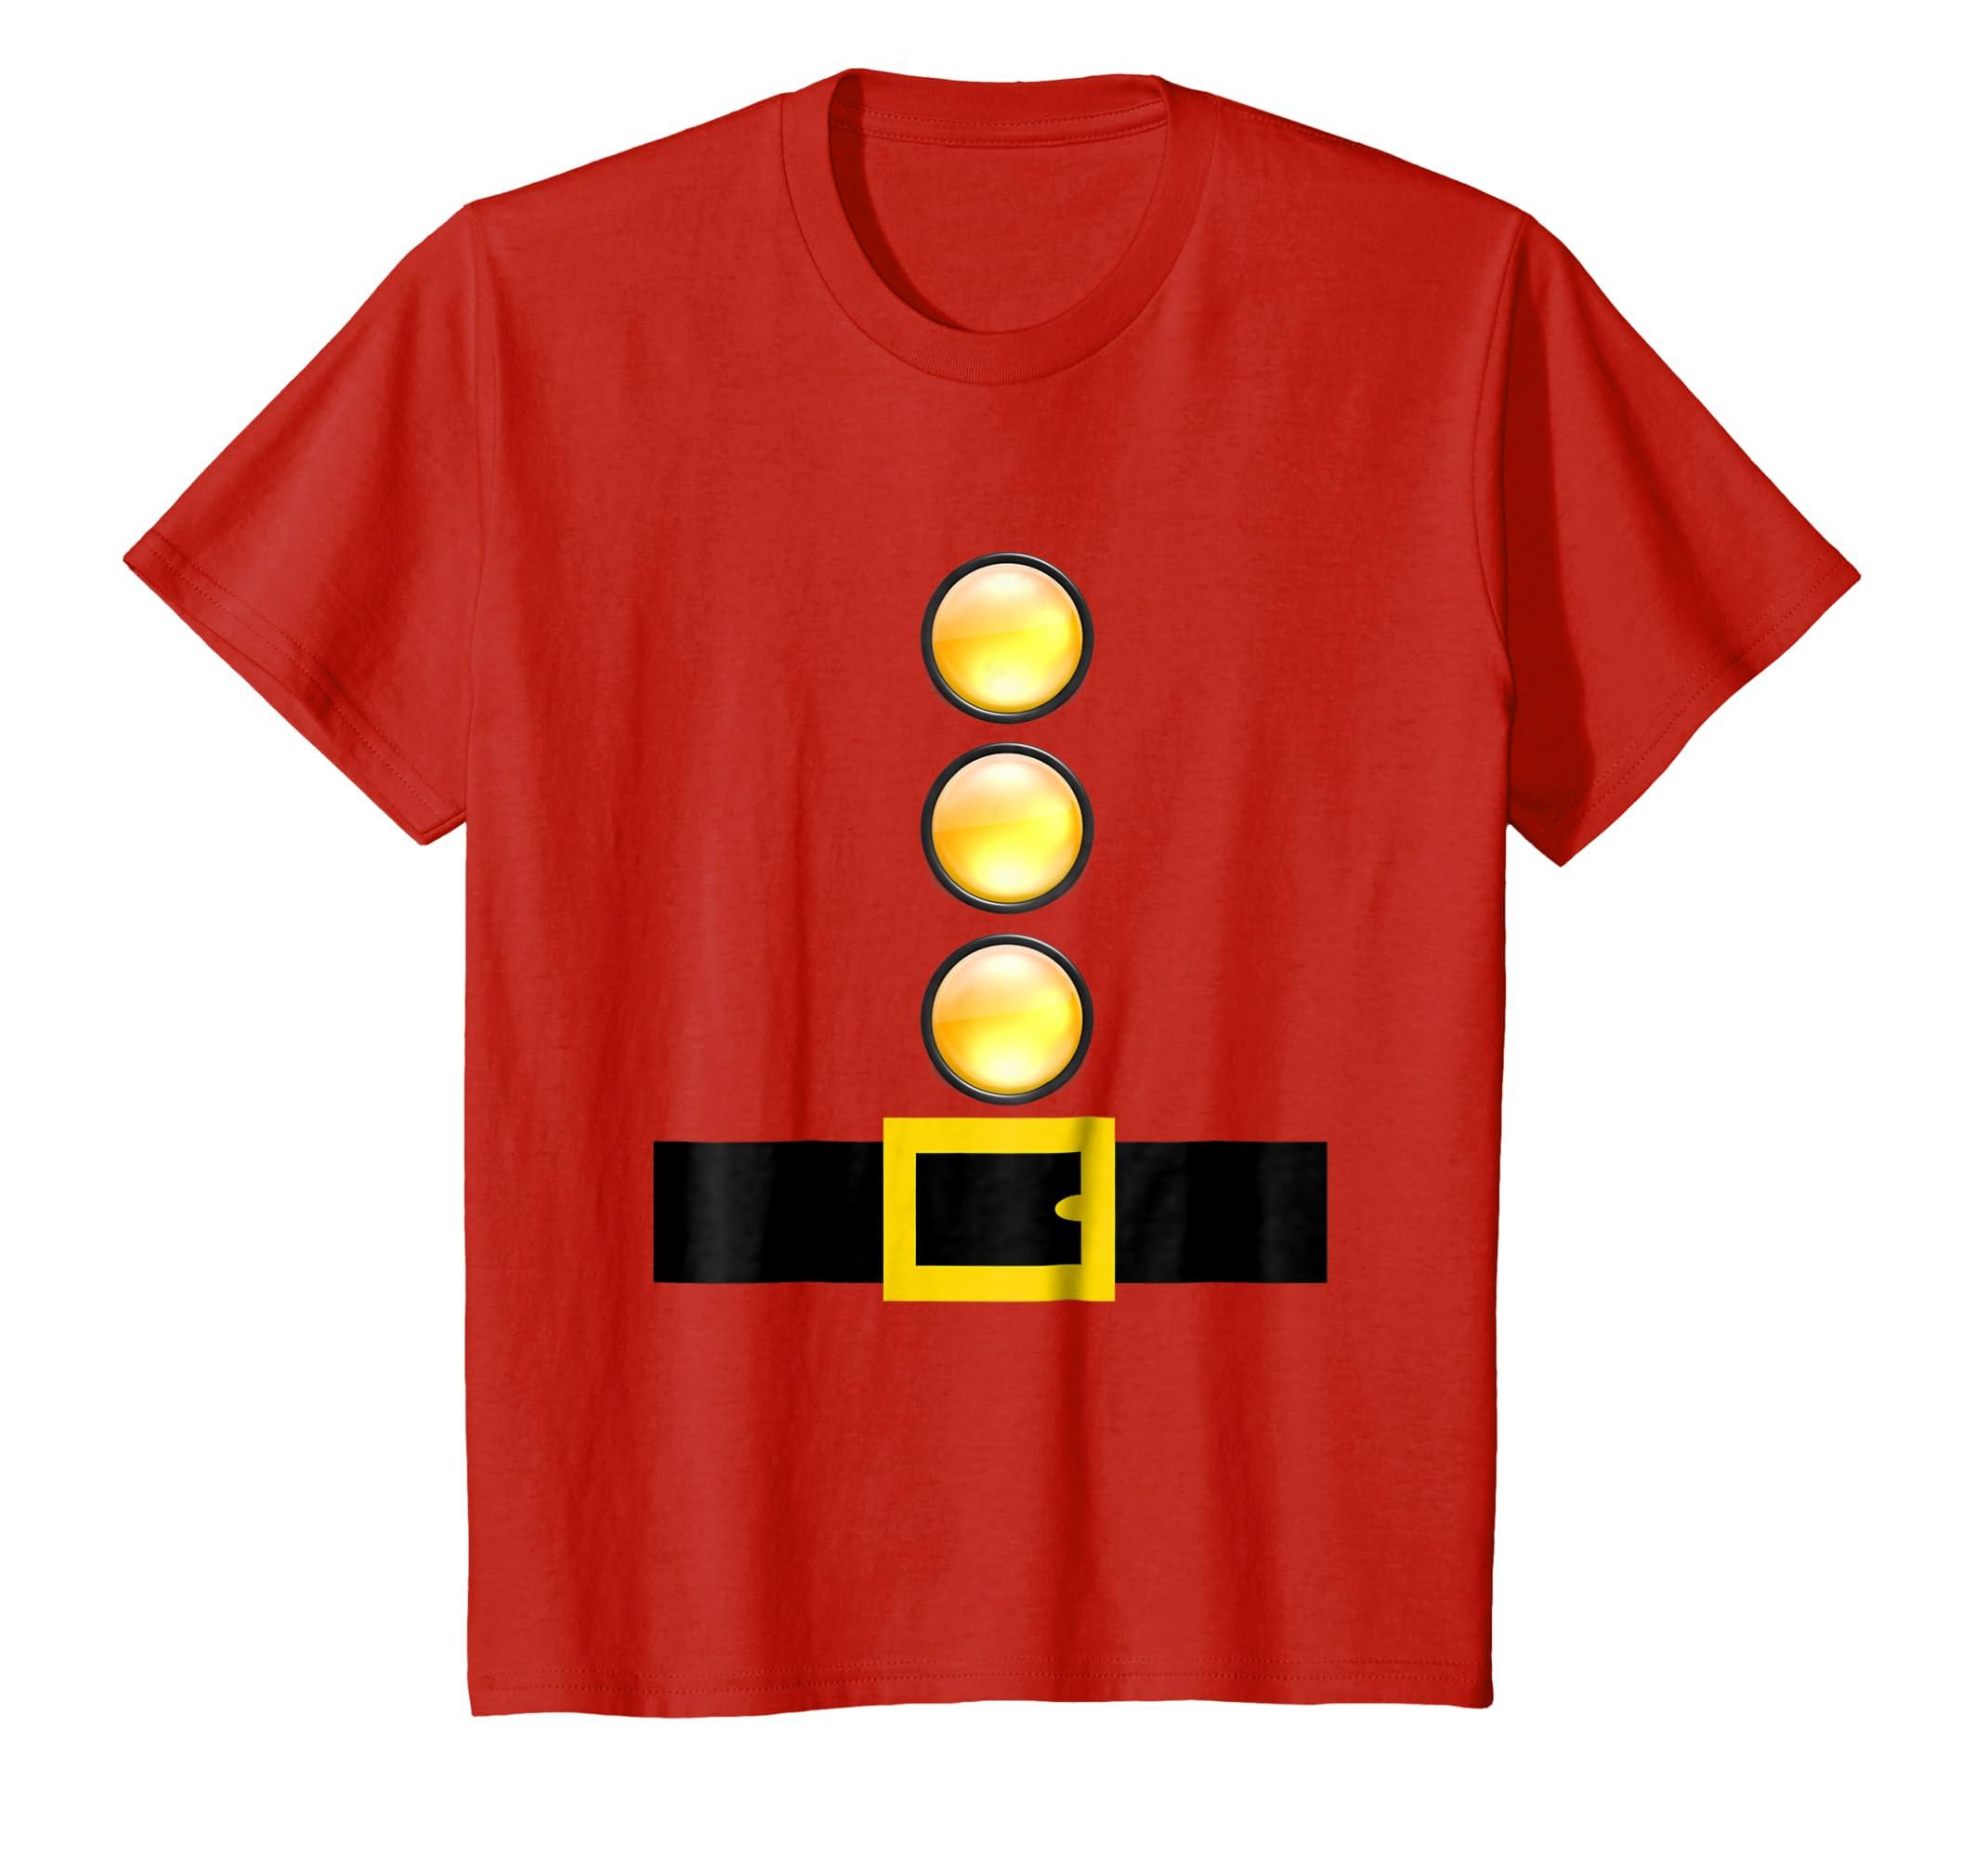 Dwarf Costume T Shirt   Funny Halloween Group Gift Idea